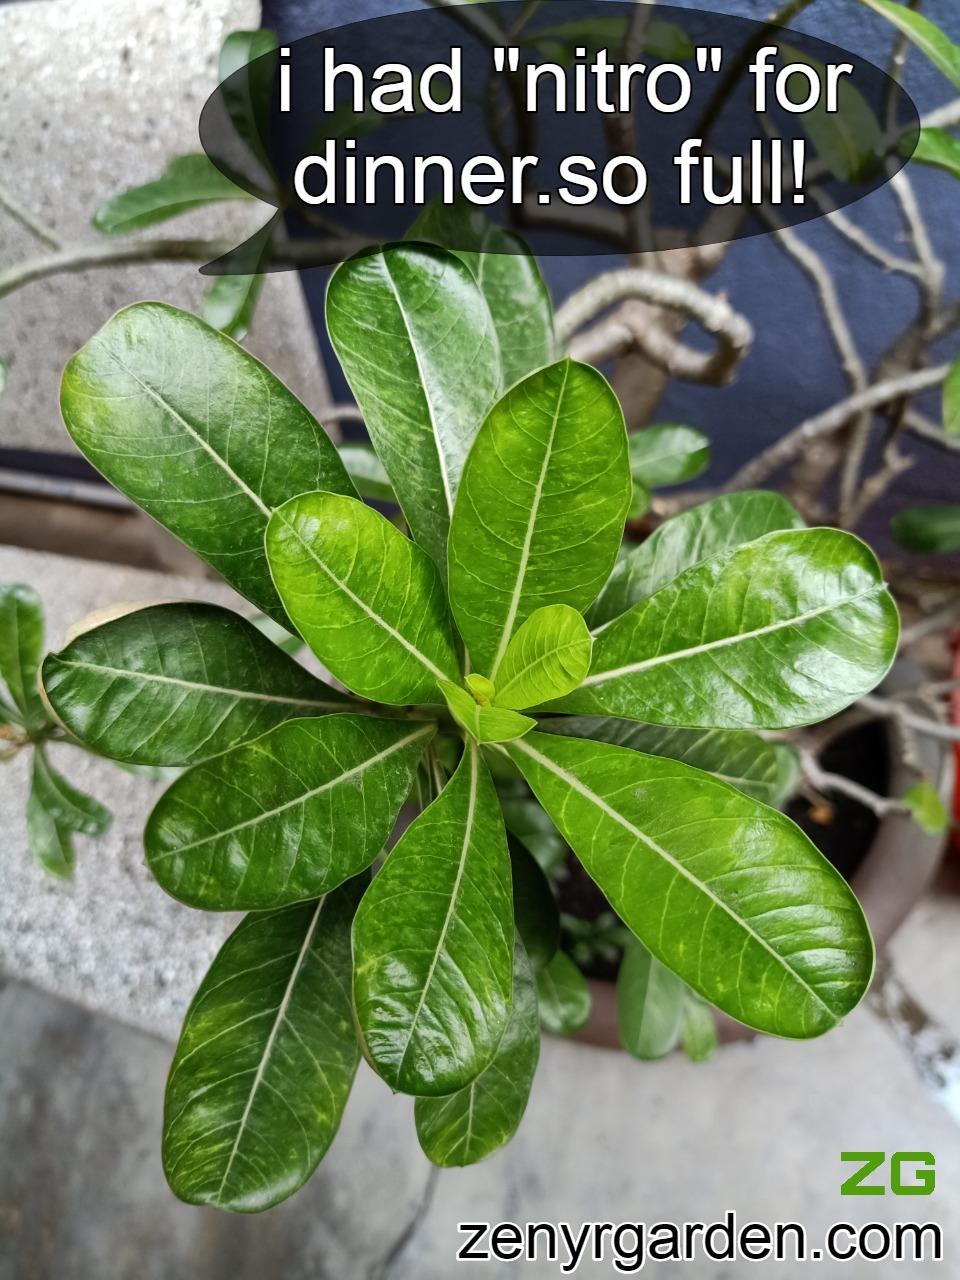 Nitrogen for leaves growth